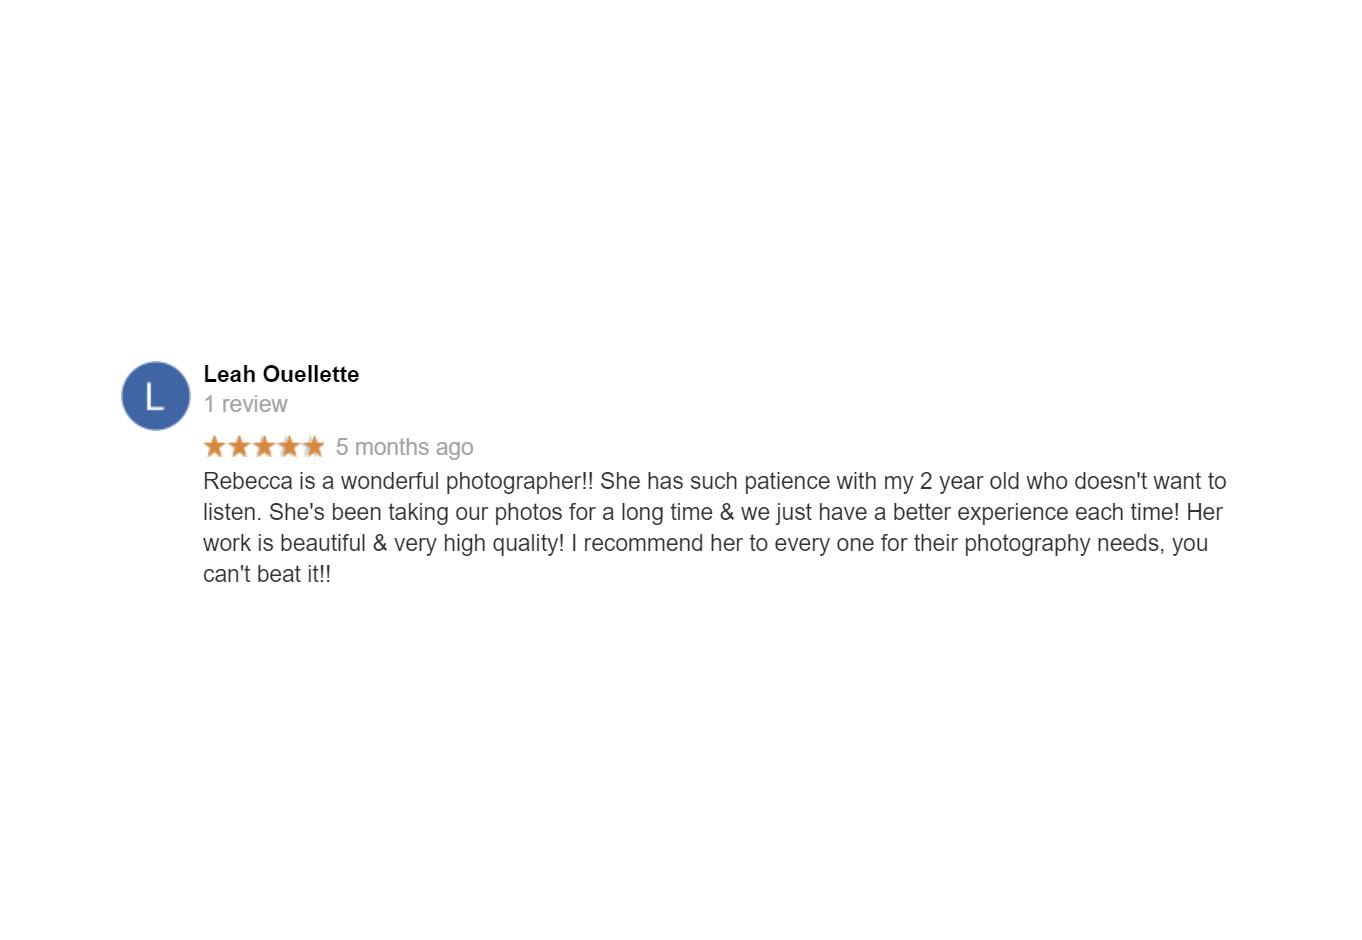 reviews_0013_Layer 37.jpg